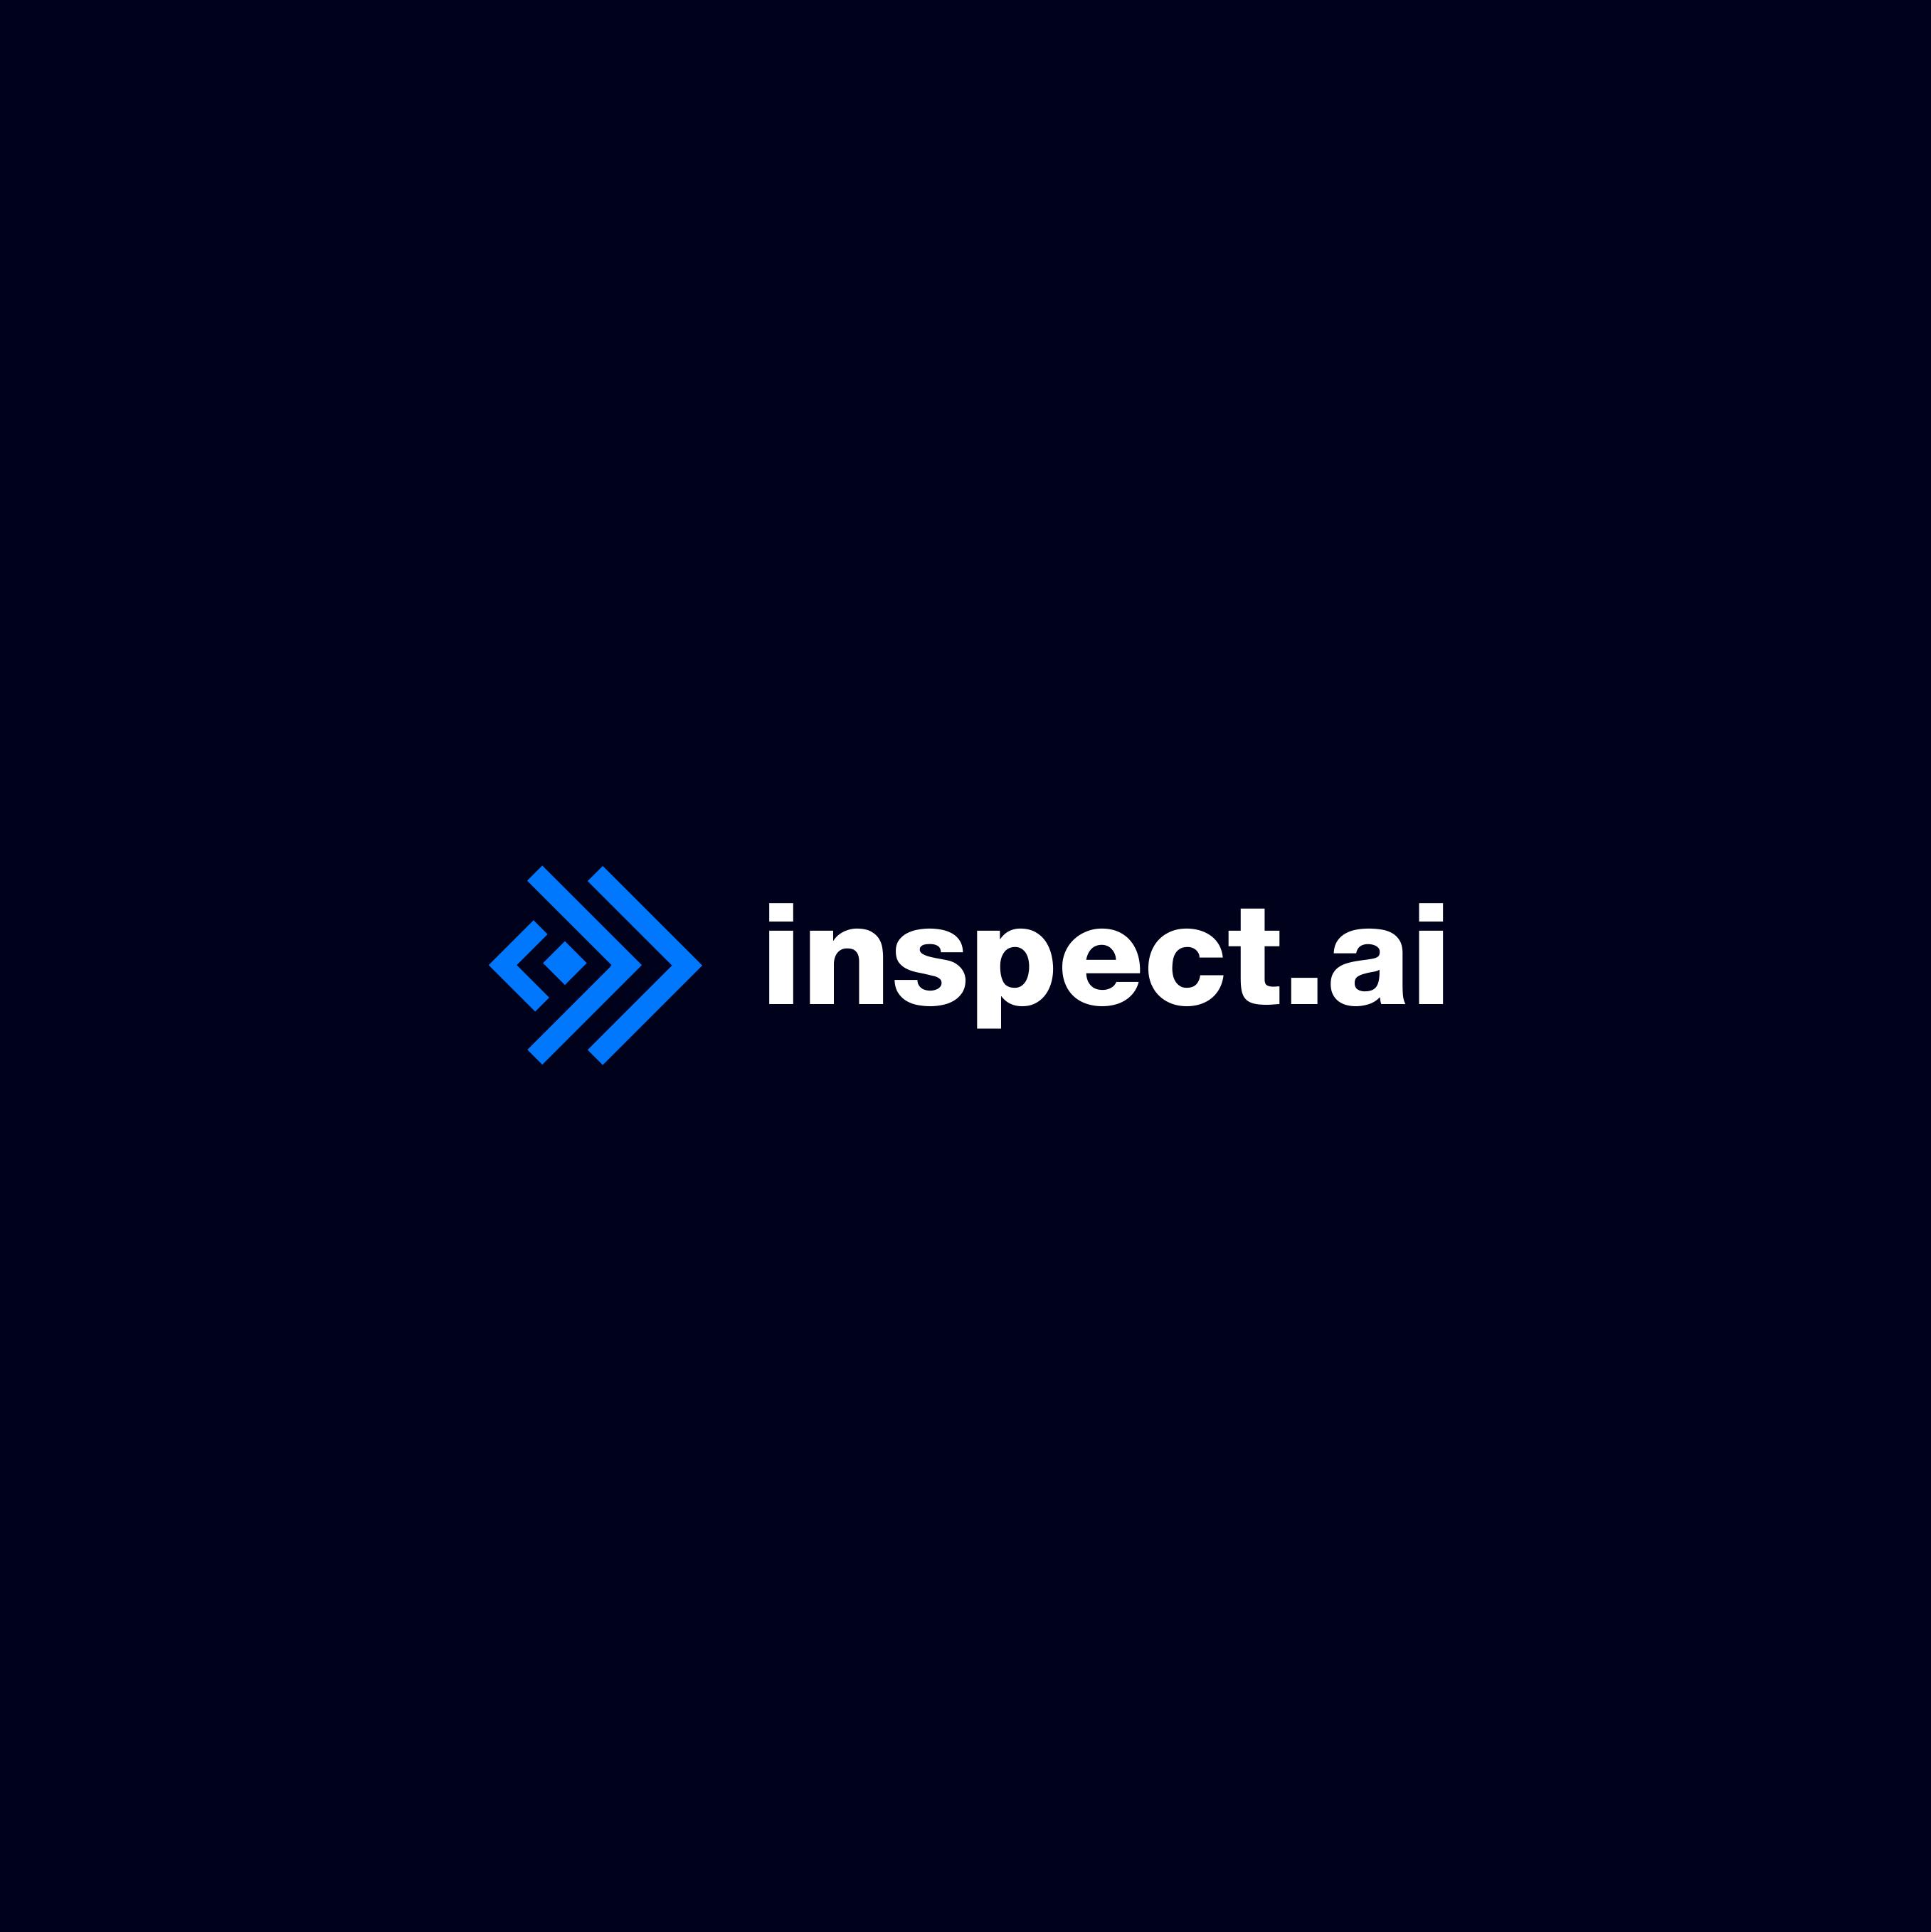 Logo and brand design for an insuretech startup